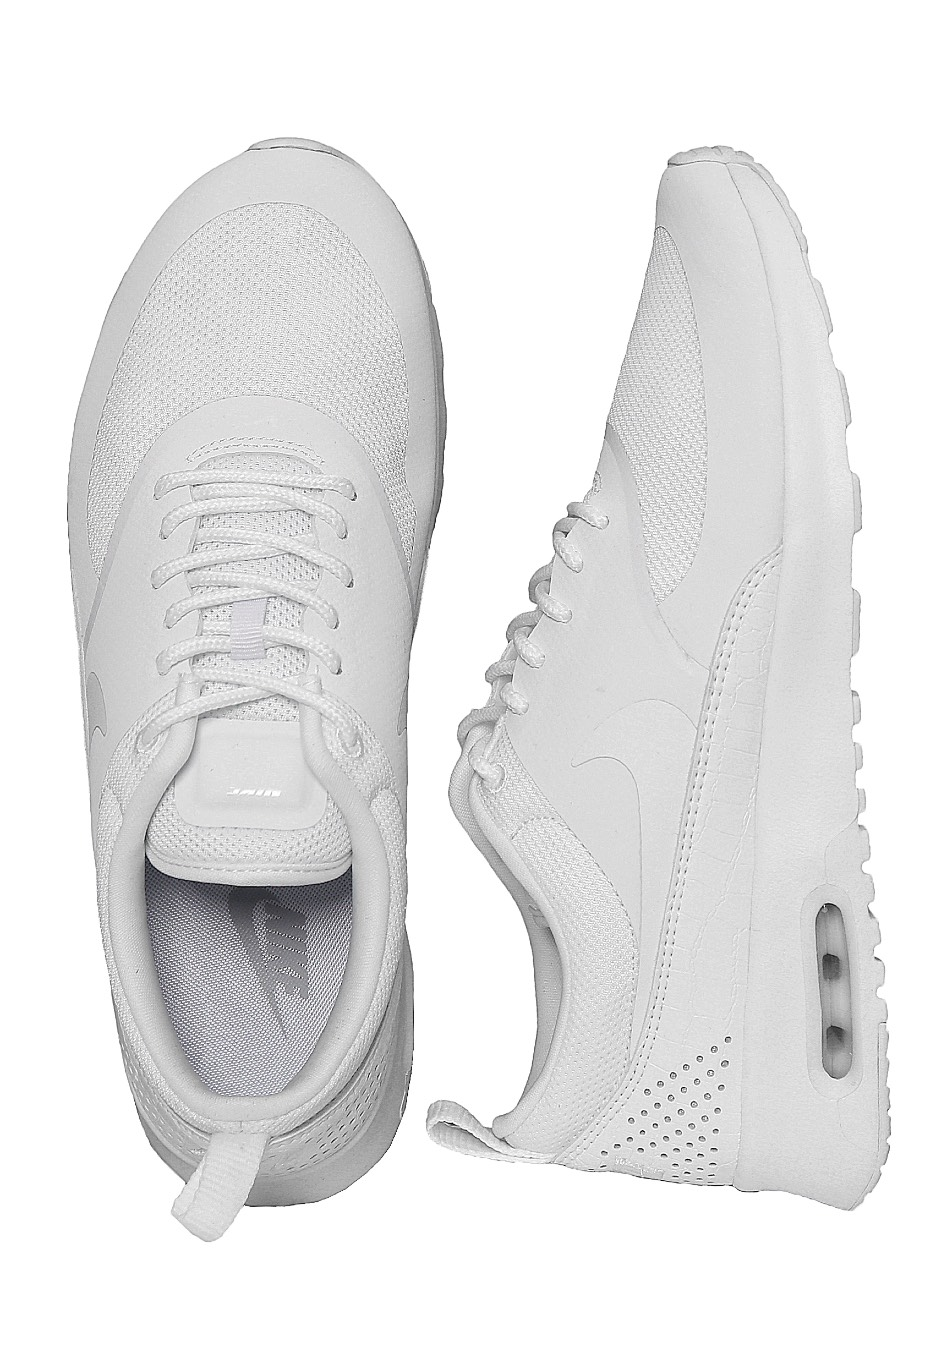 Nike - Air Max Thea White  White White - Girl Shoes - Impericon.com UK cfab1915e